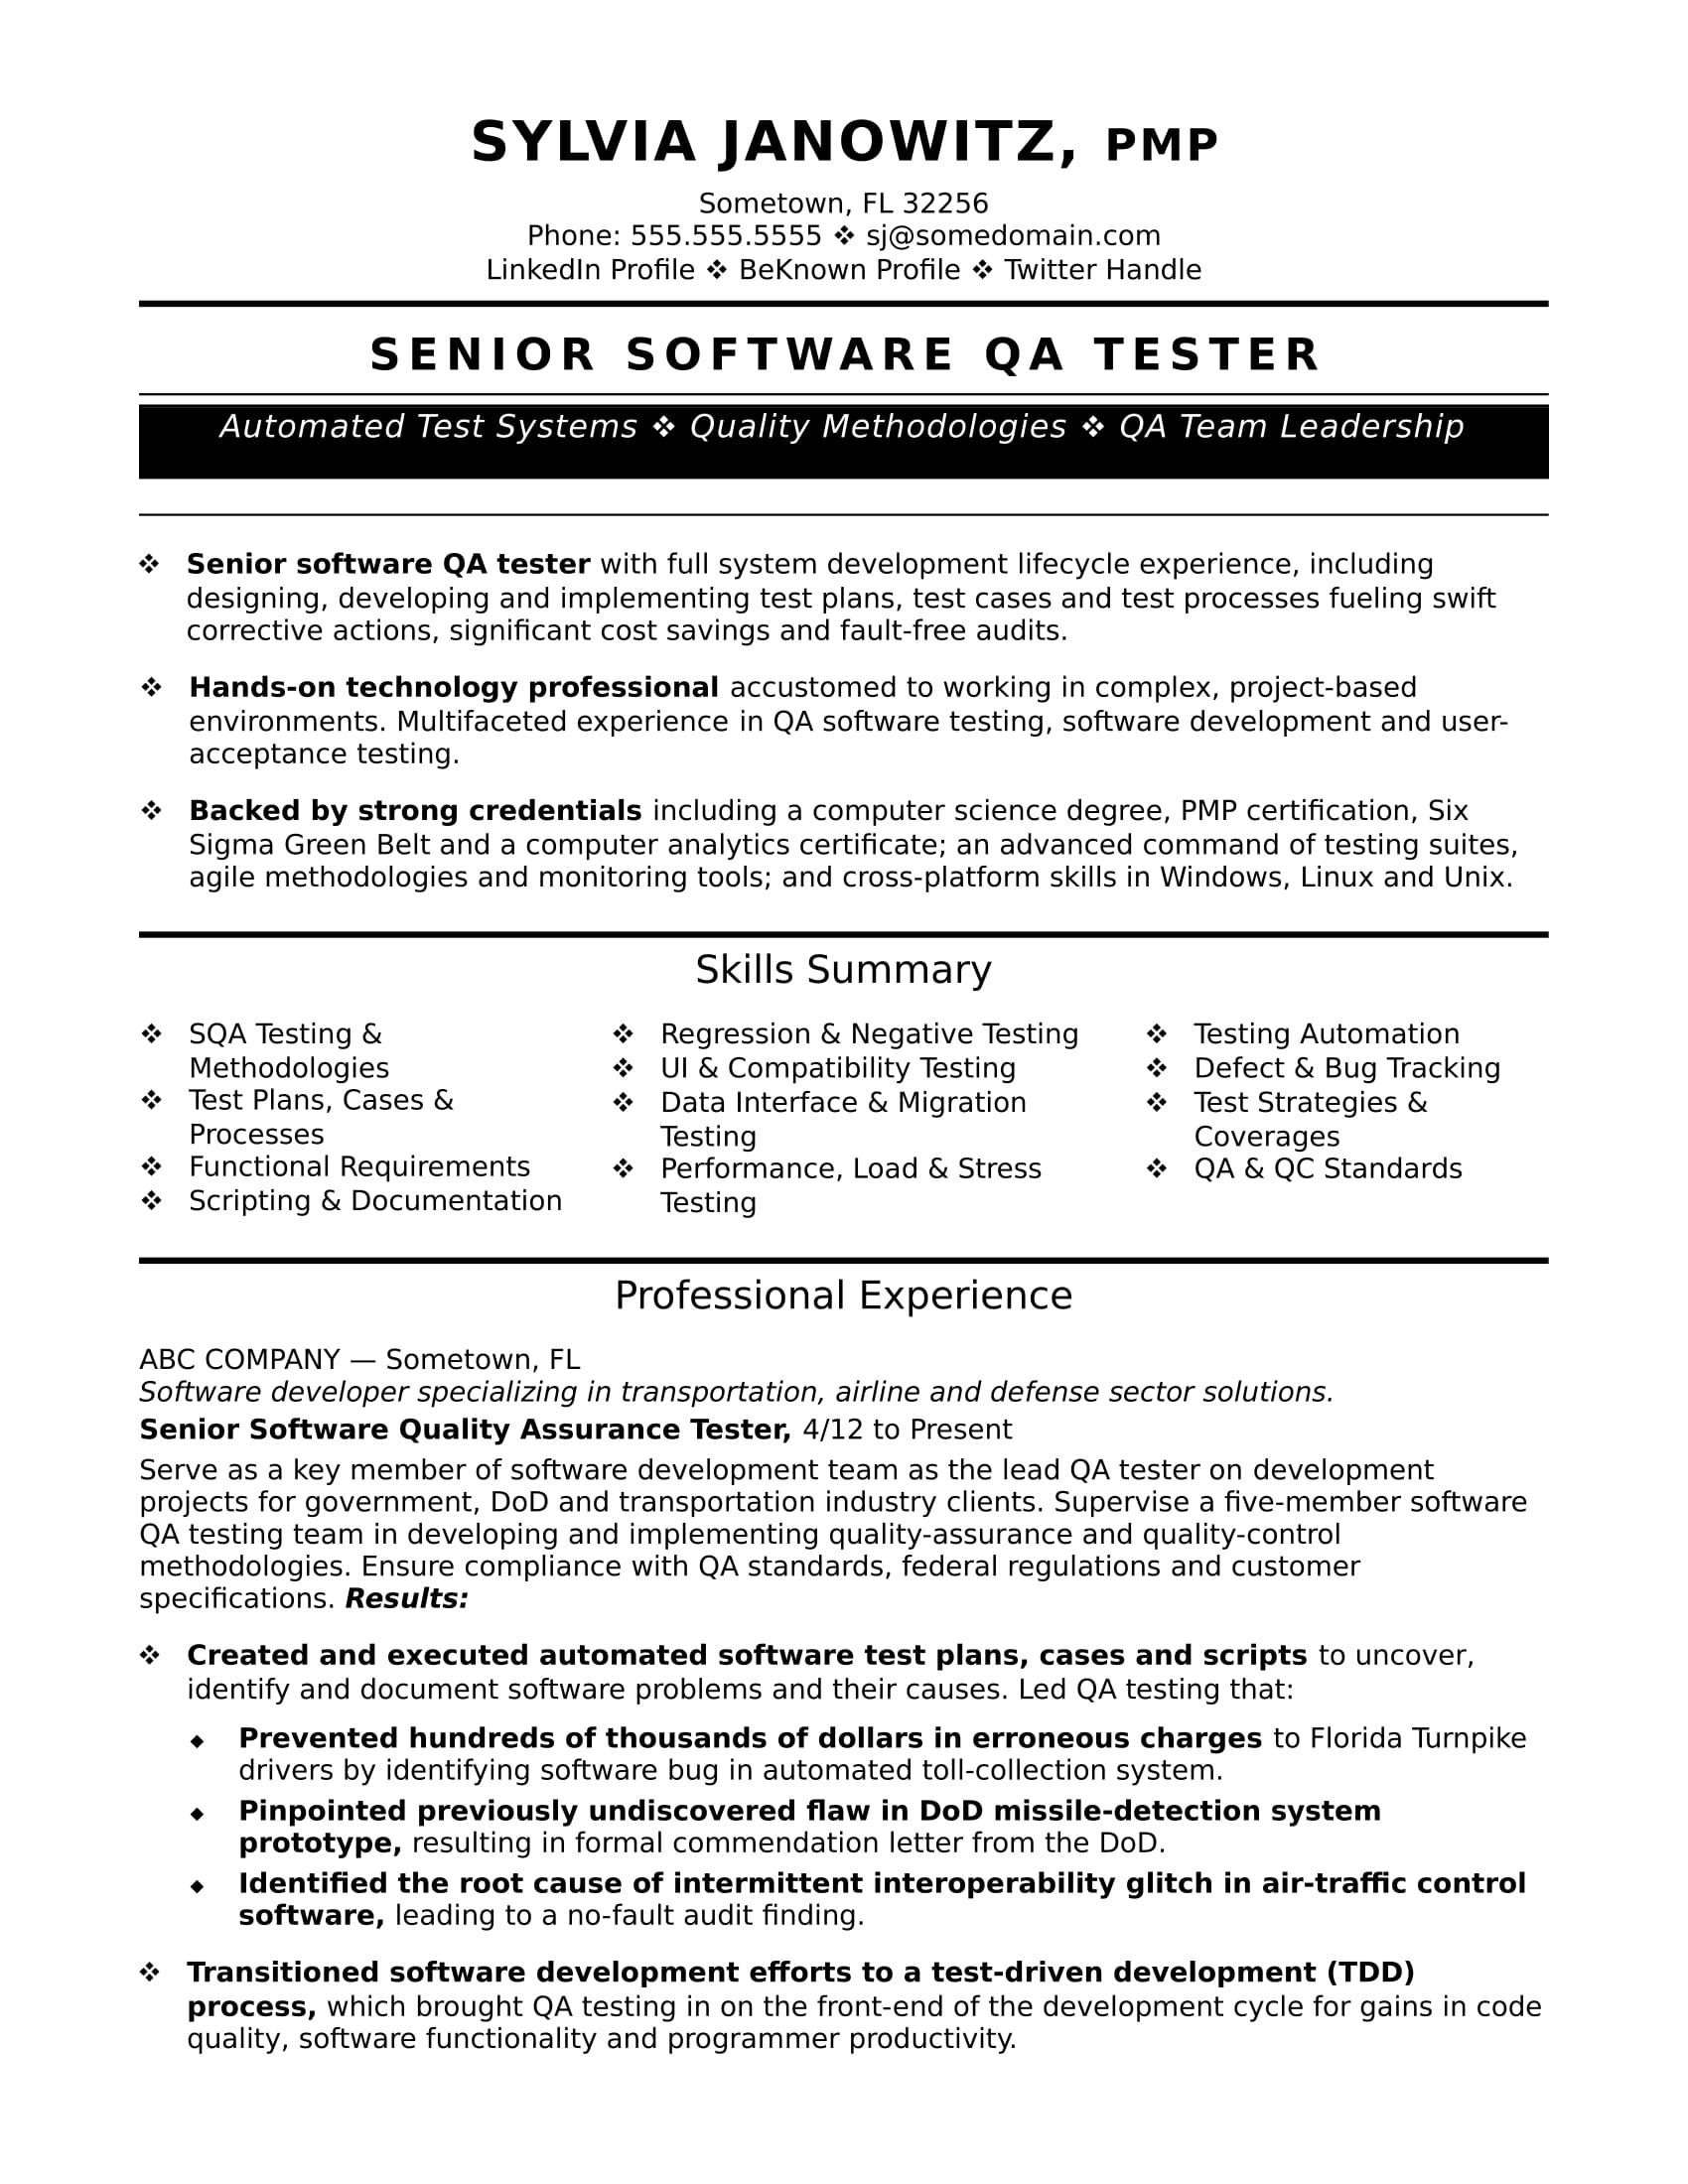 Experienced Qa Software Tester Resume Sample Monster Com